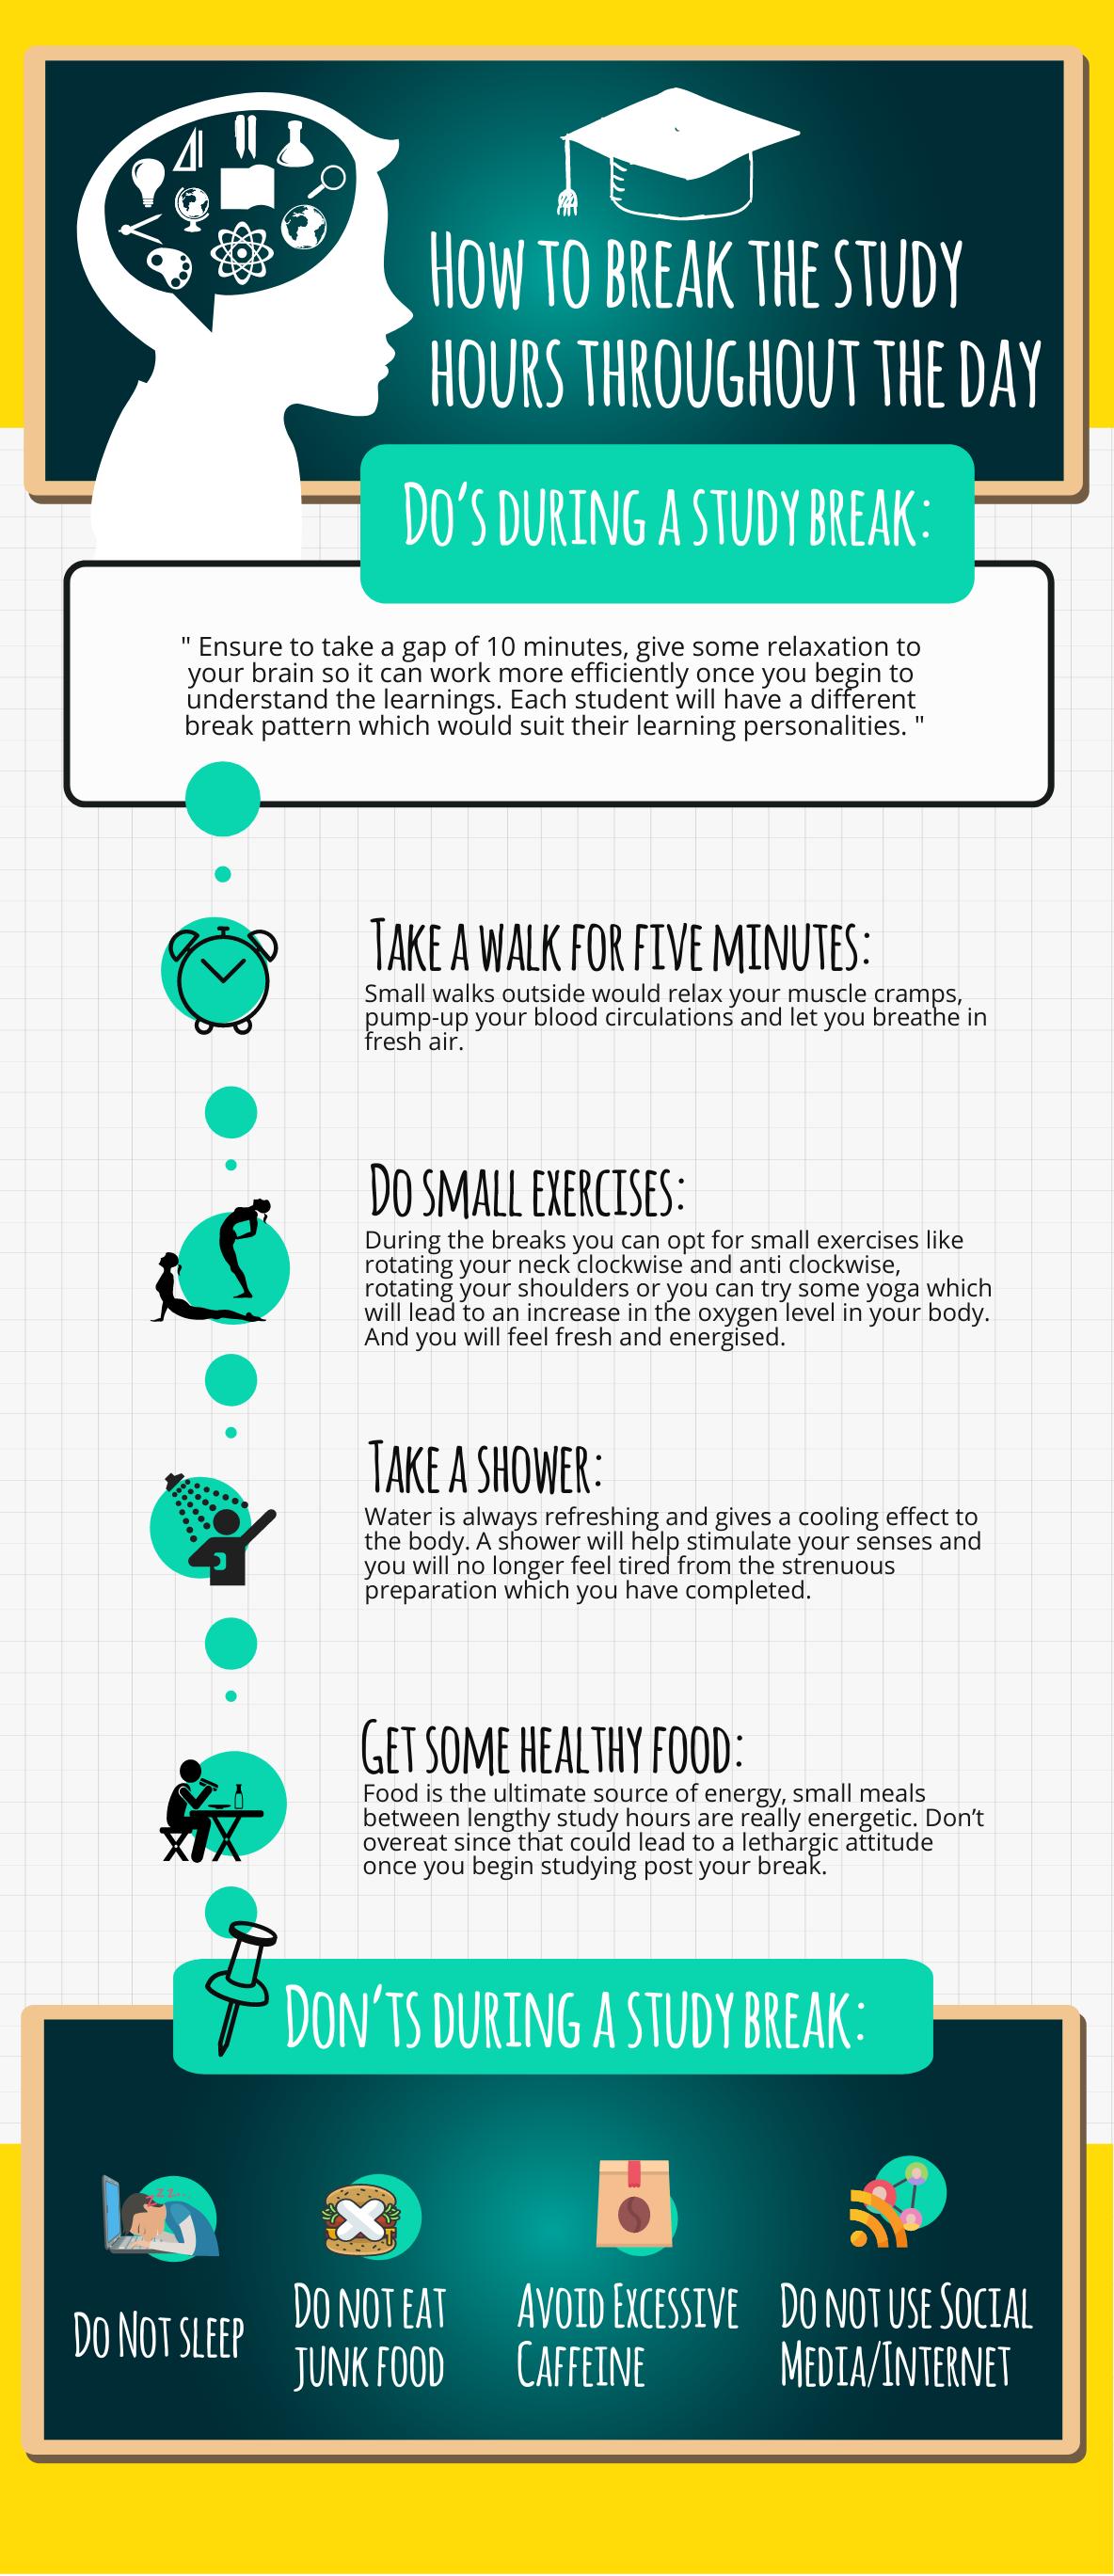 How to take a study break